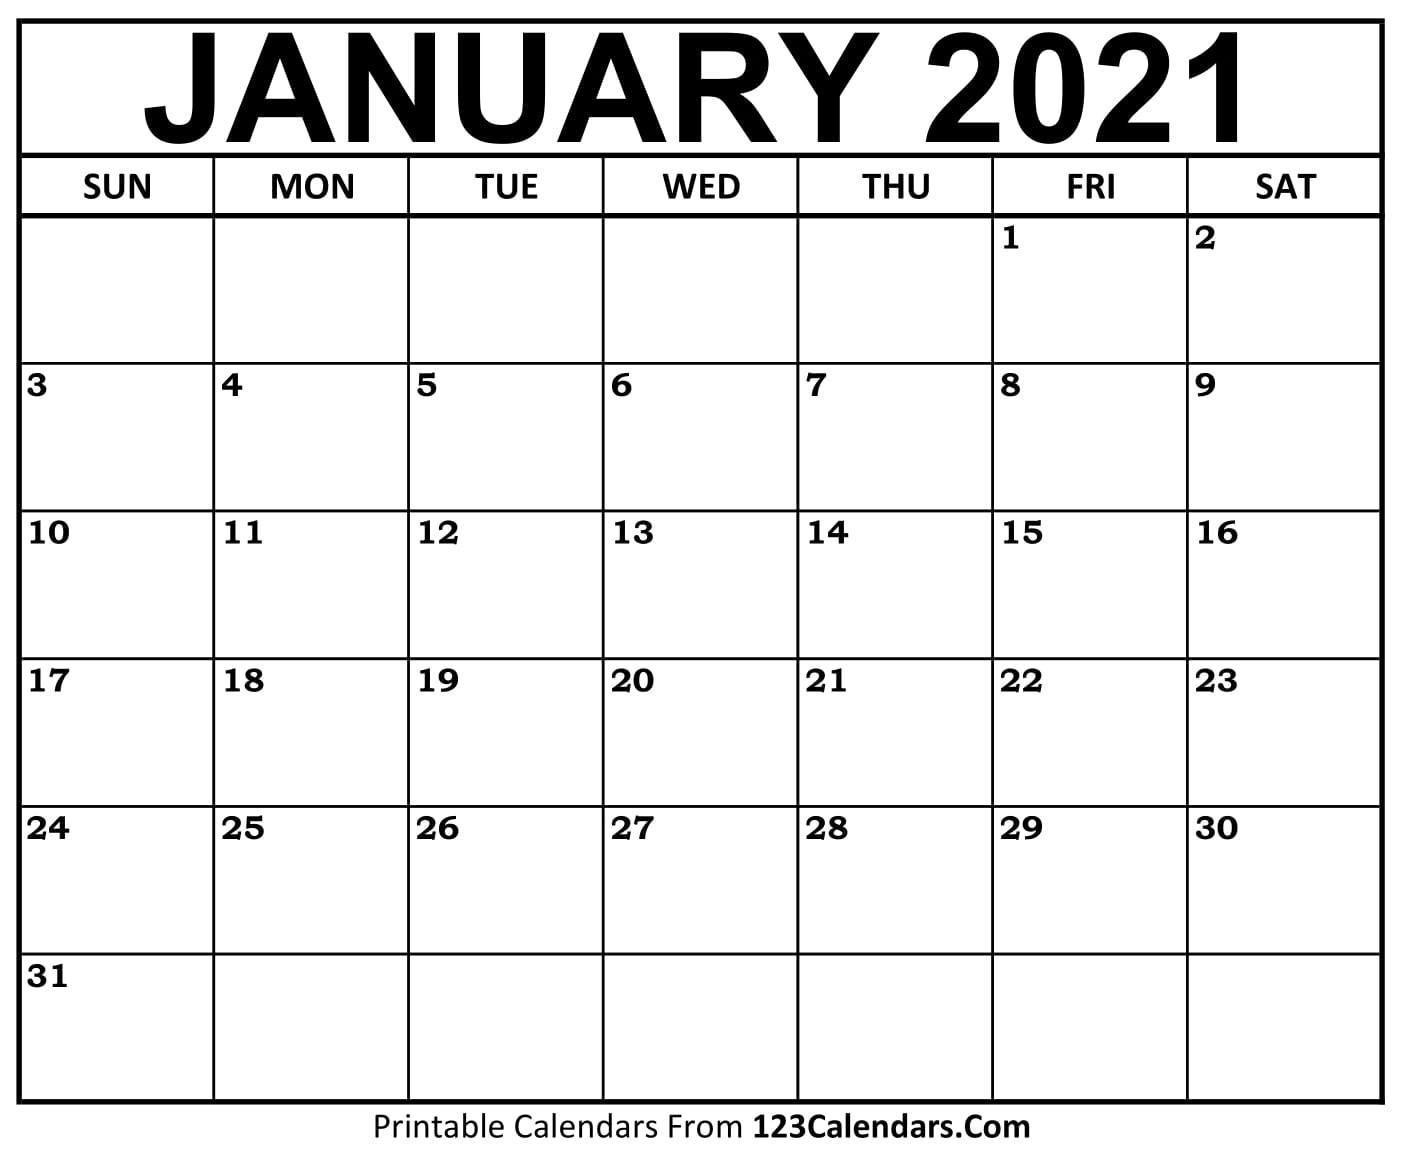 2021 Printable Calendar | 123Calendars  Calendar 2021 2021 2021 Printable Free